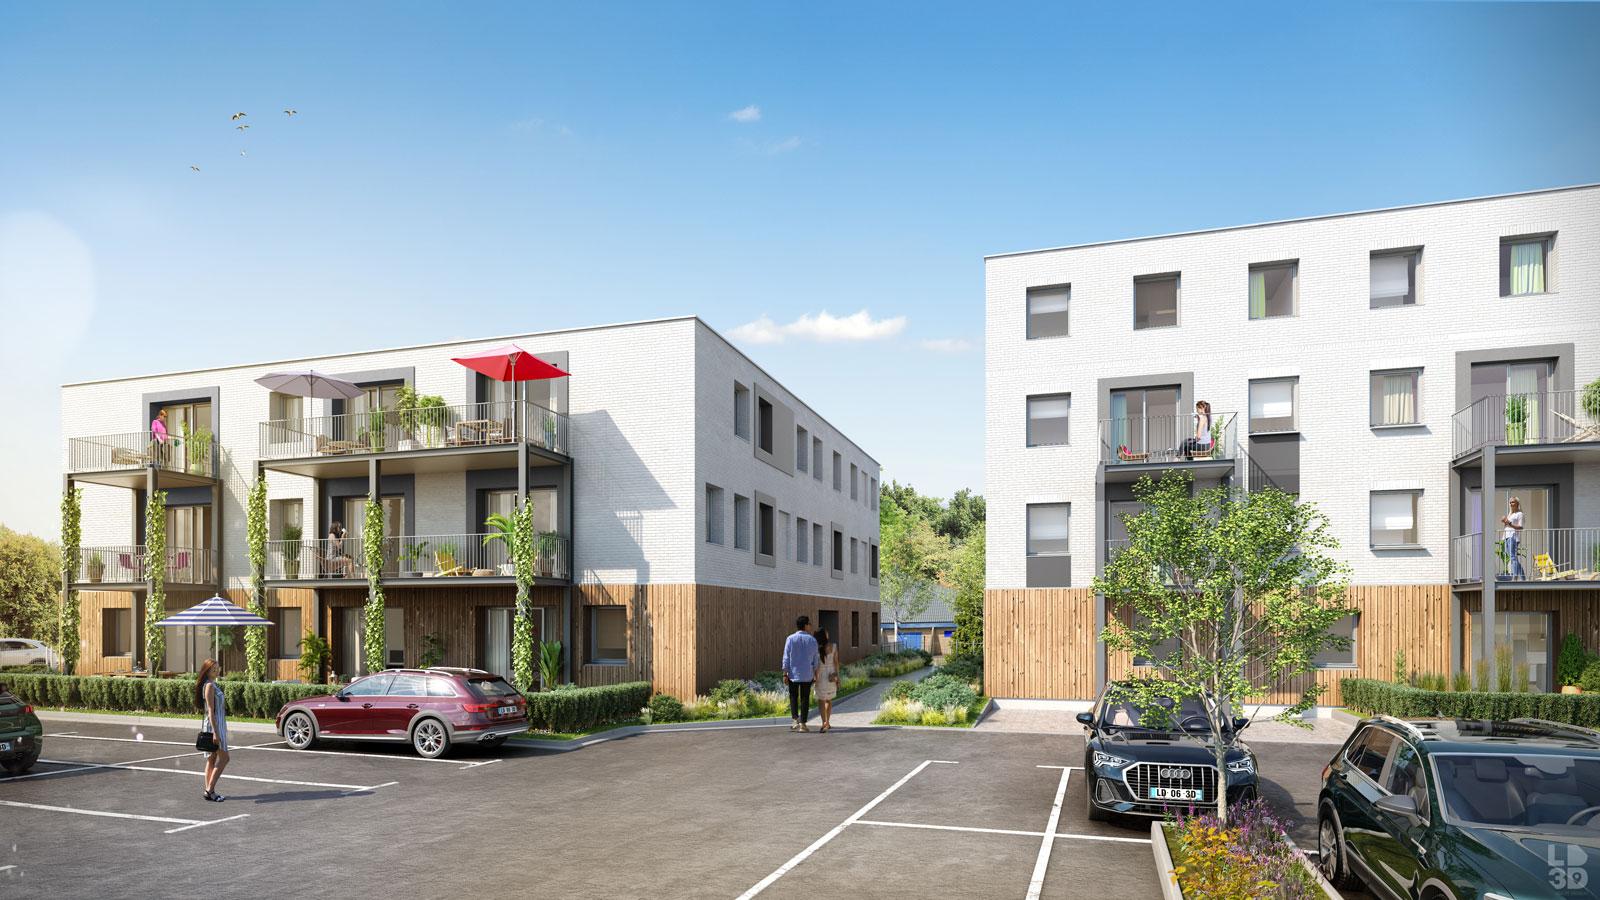 Programme immobilier Jules & Fernand - Marcq en Baroeul